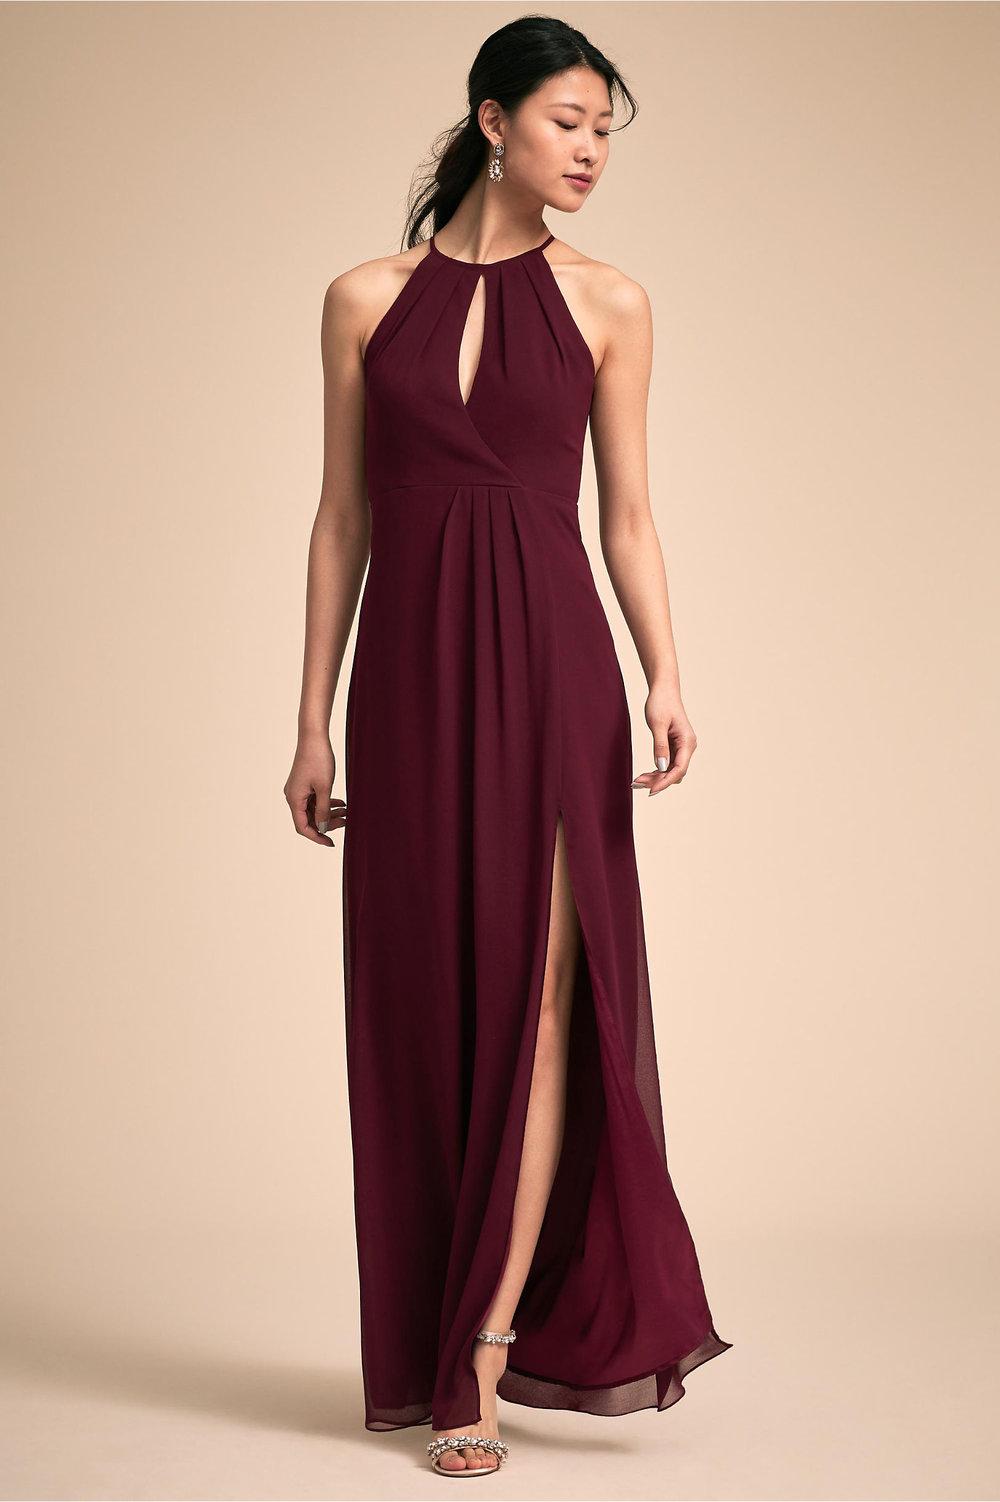 Marco Wedding Dress in Wine by BHLDN